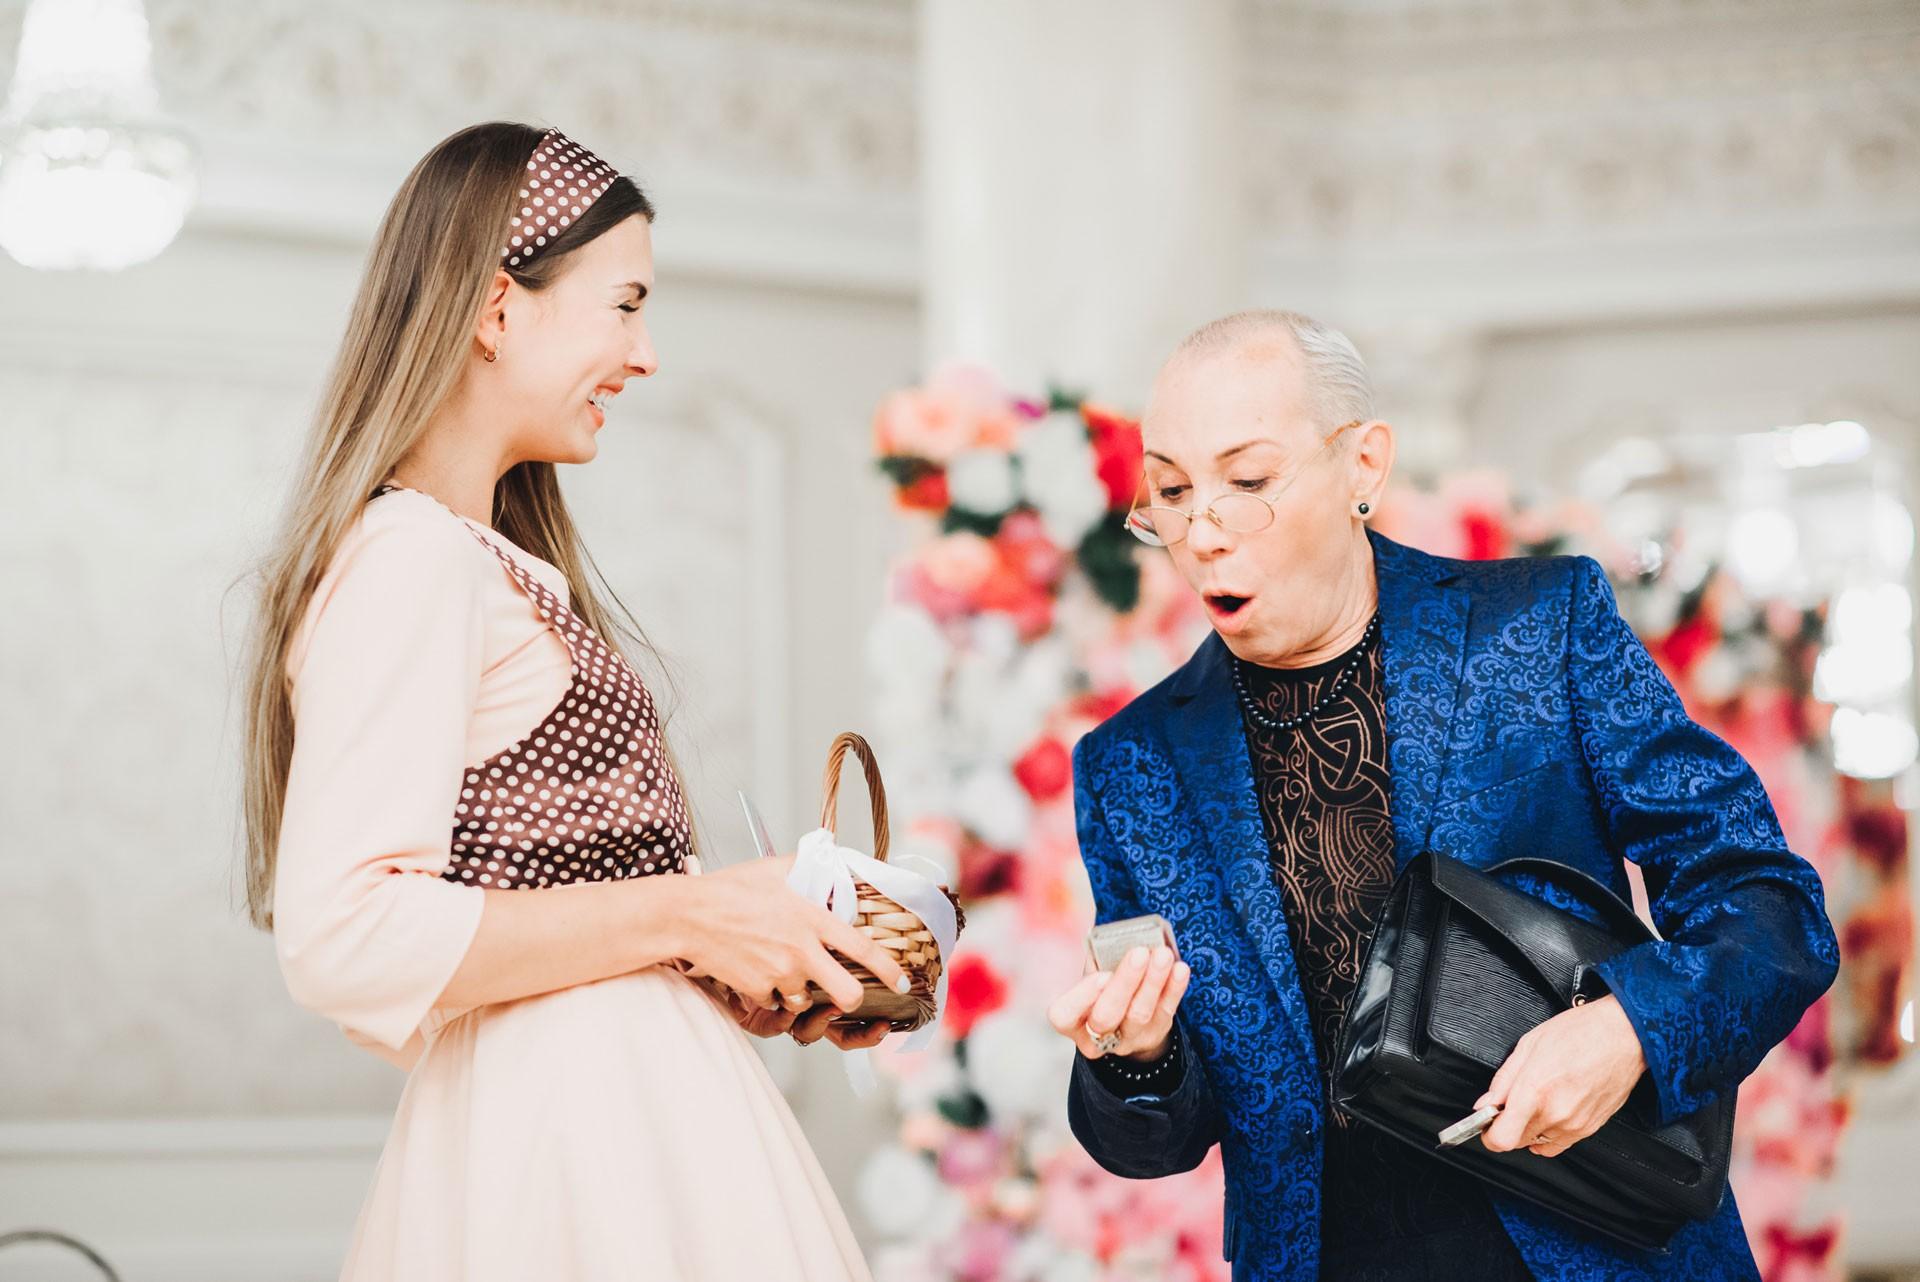 Свадьба Ксении Сябитовой и Андрея Снеткова фото 11